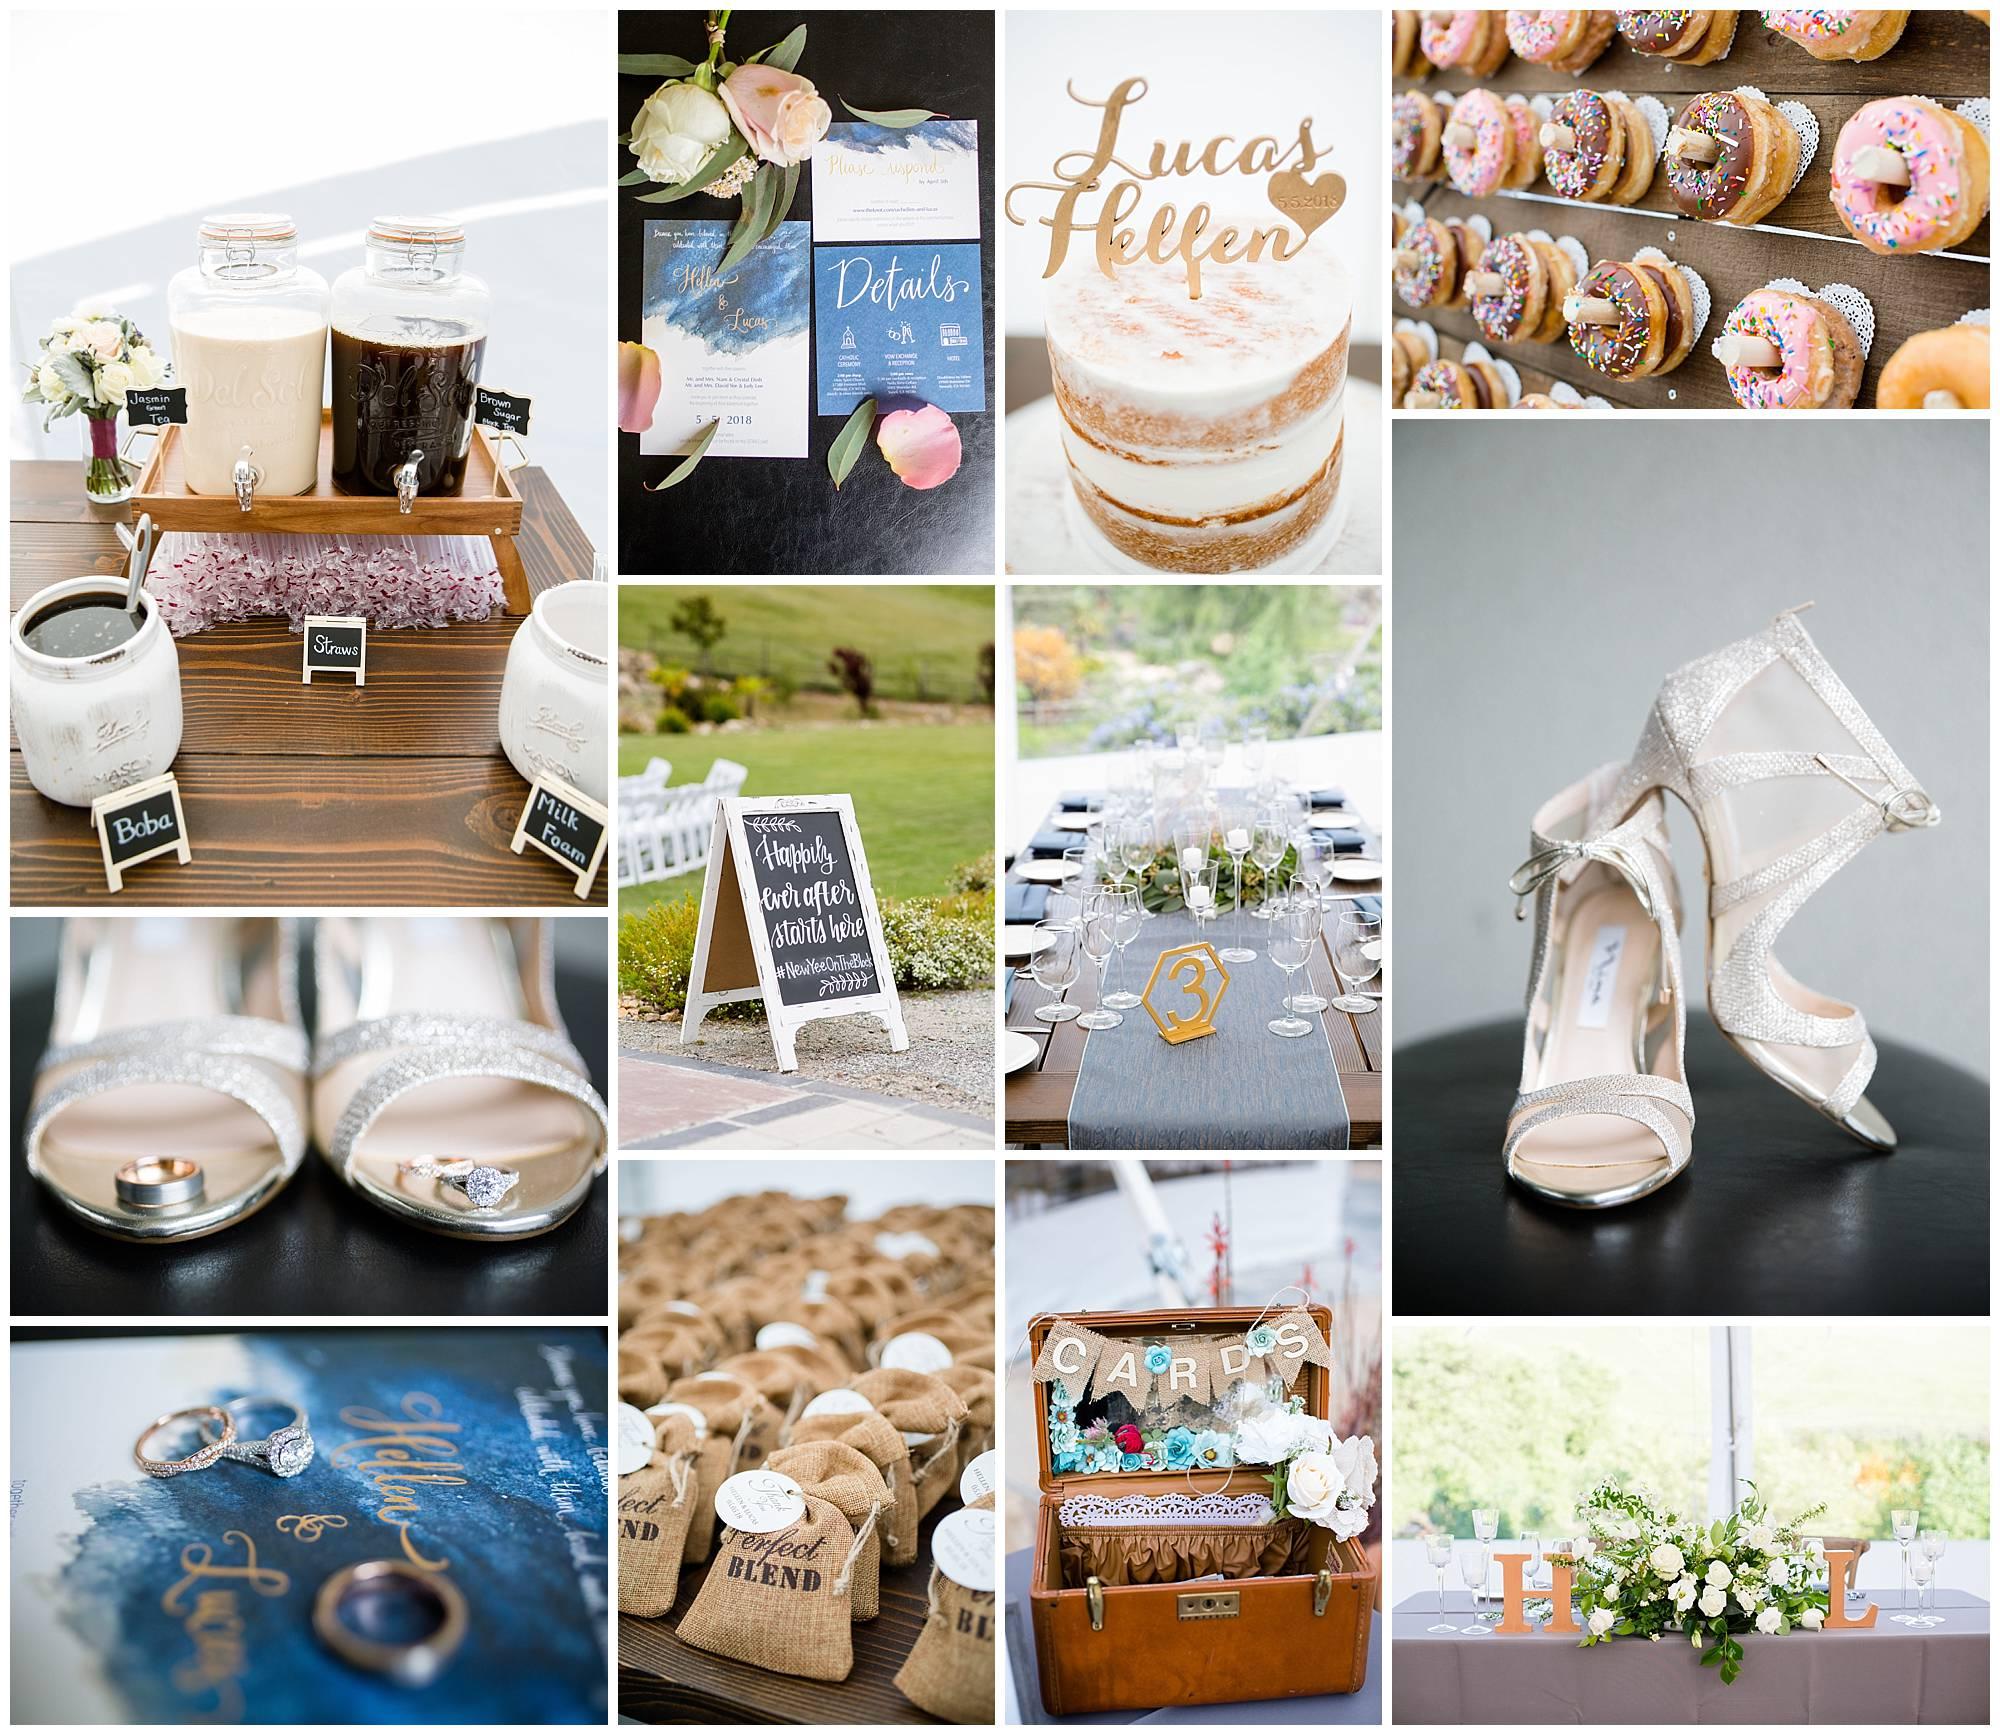 Collage of detail wedding photos